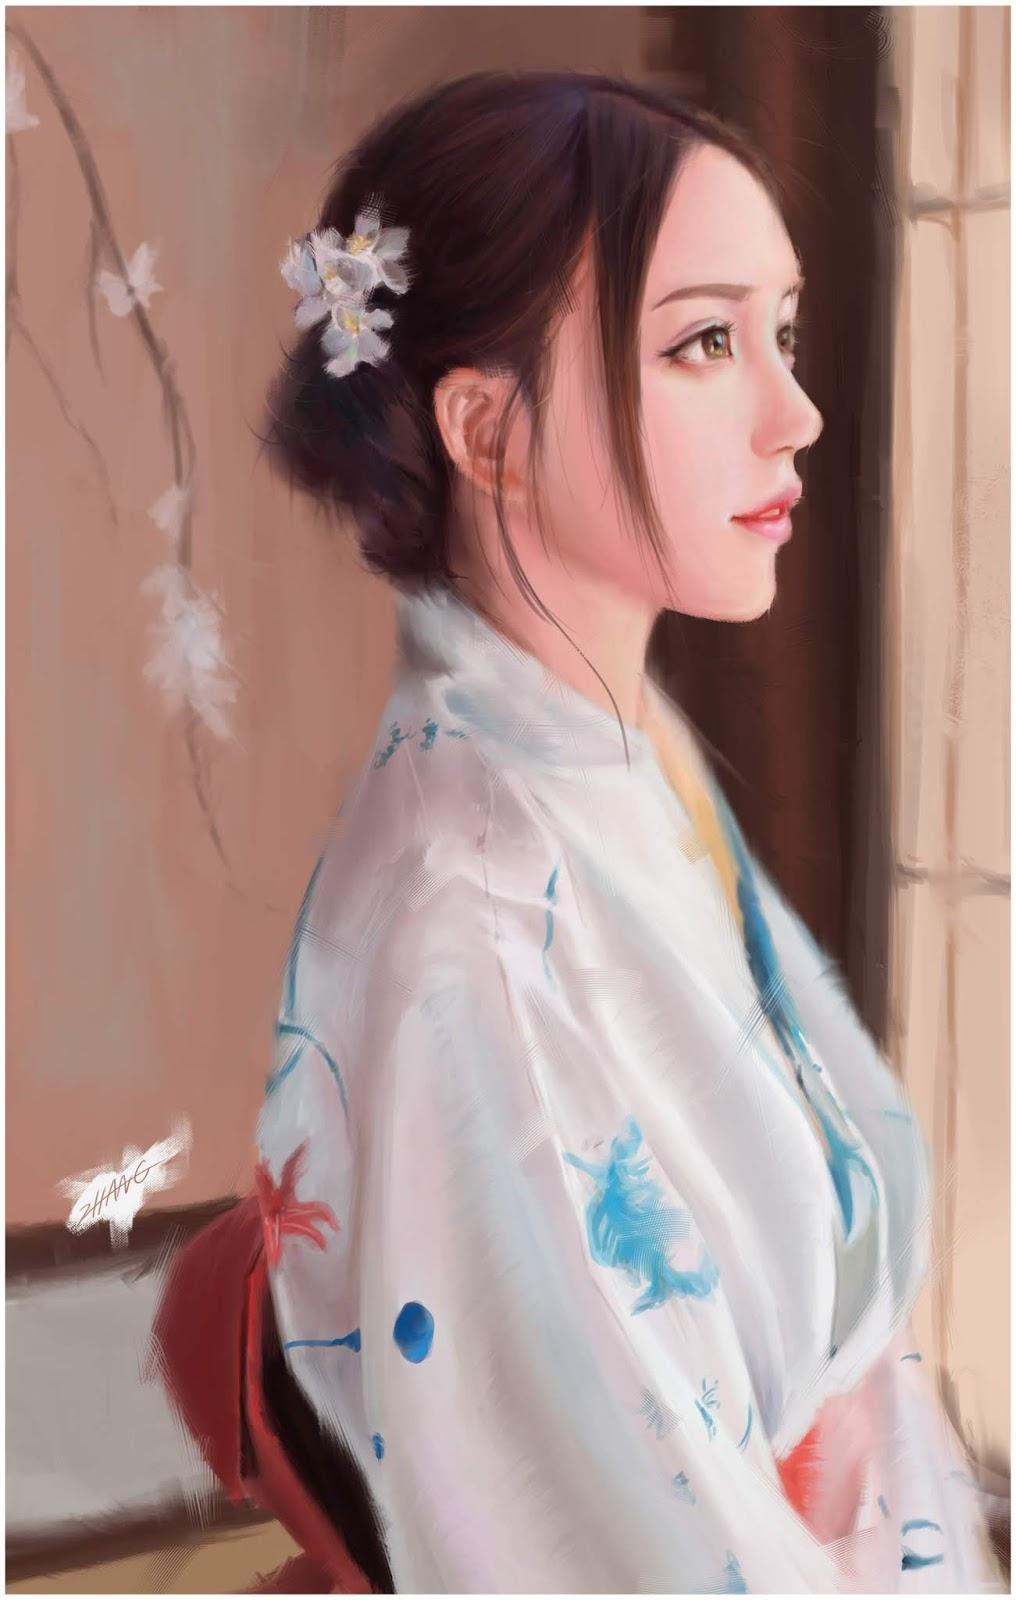 Digital Art by R Zhang